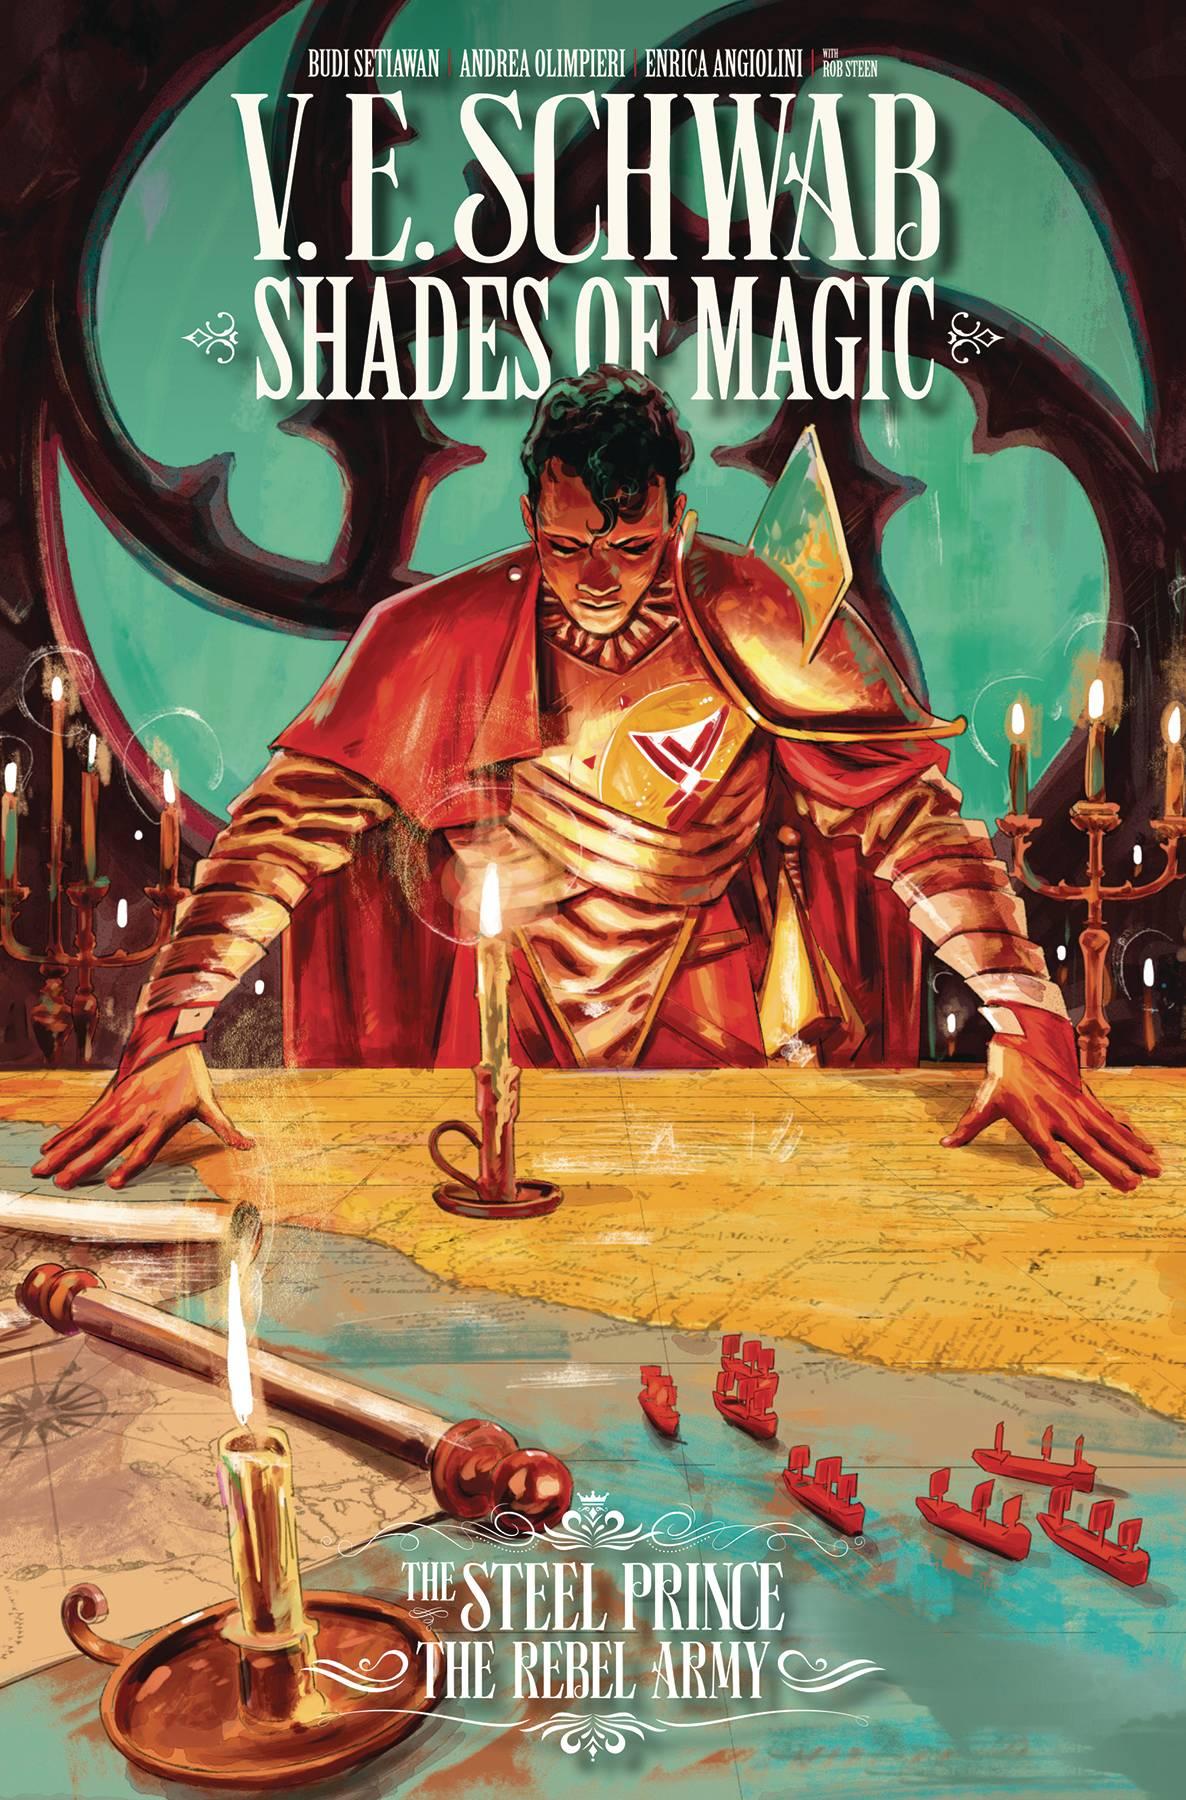 Shades Of Magic: The Rebel Army #4 (2020)